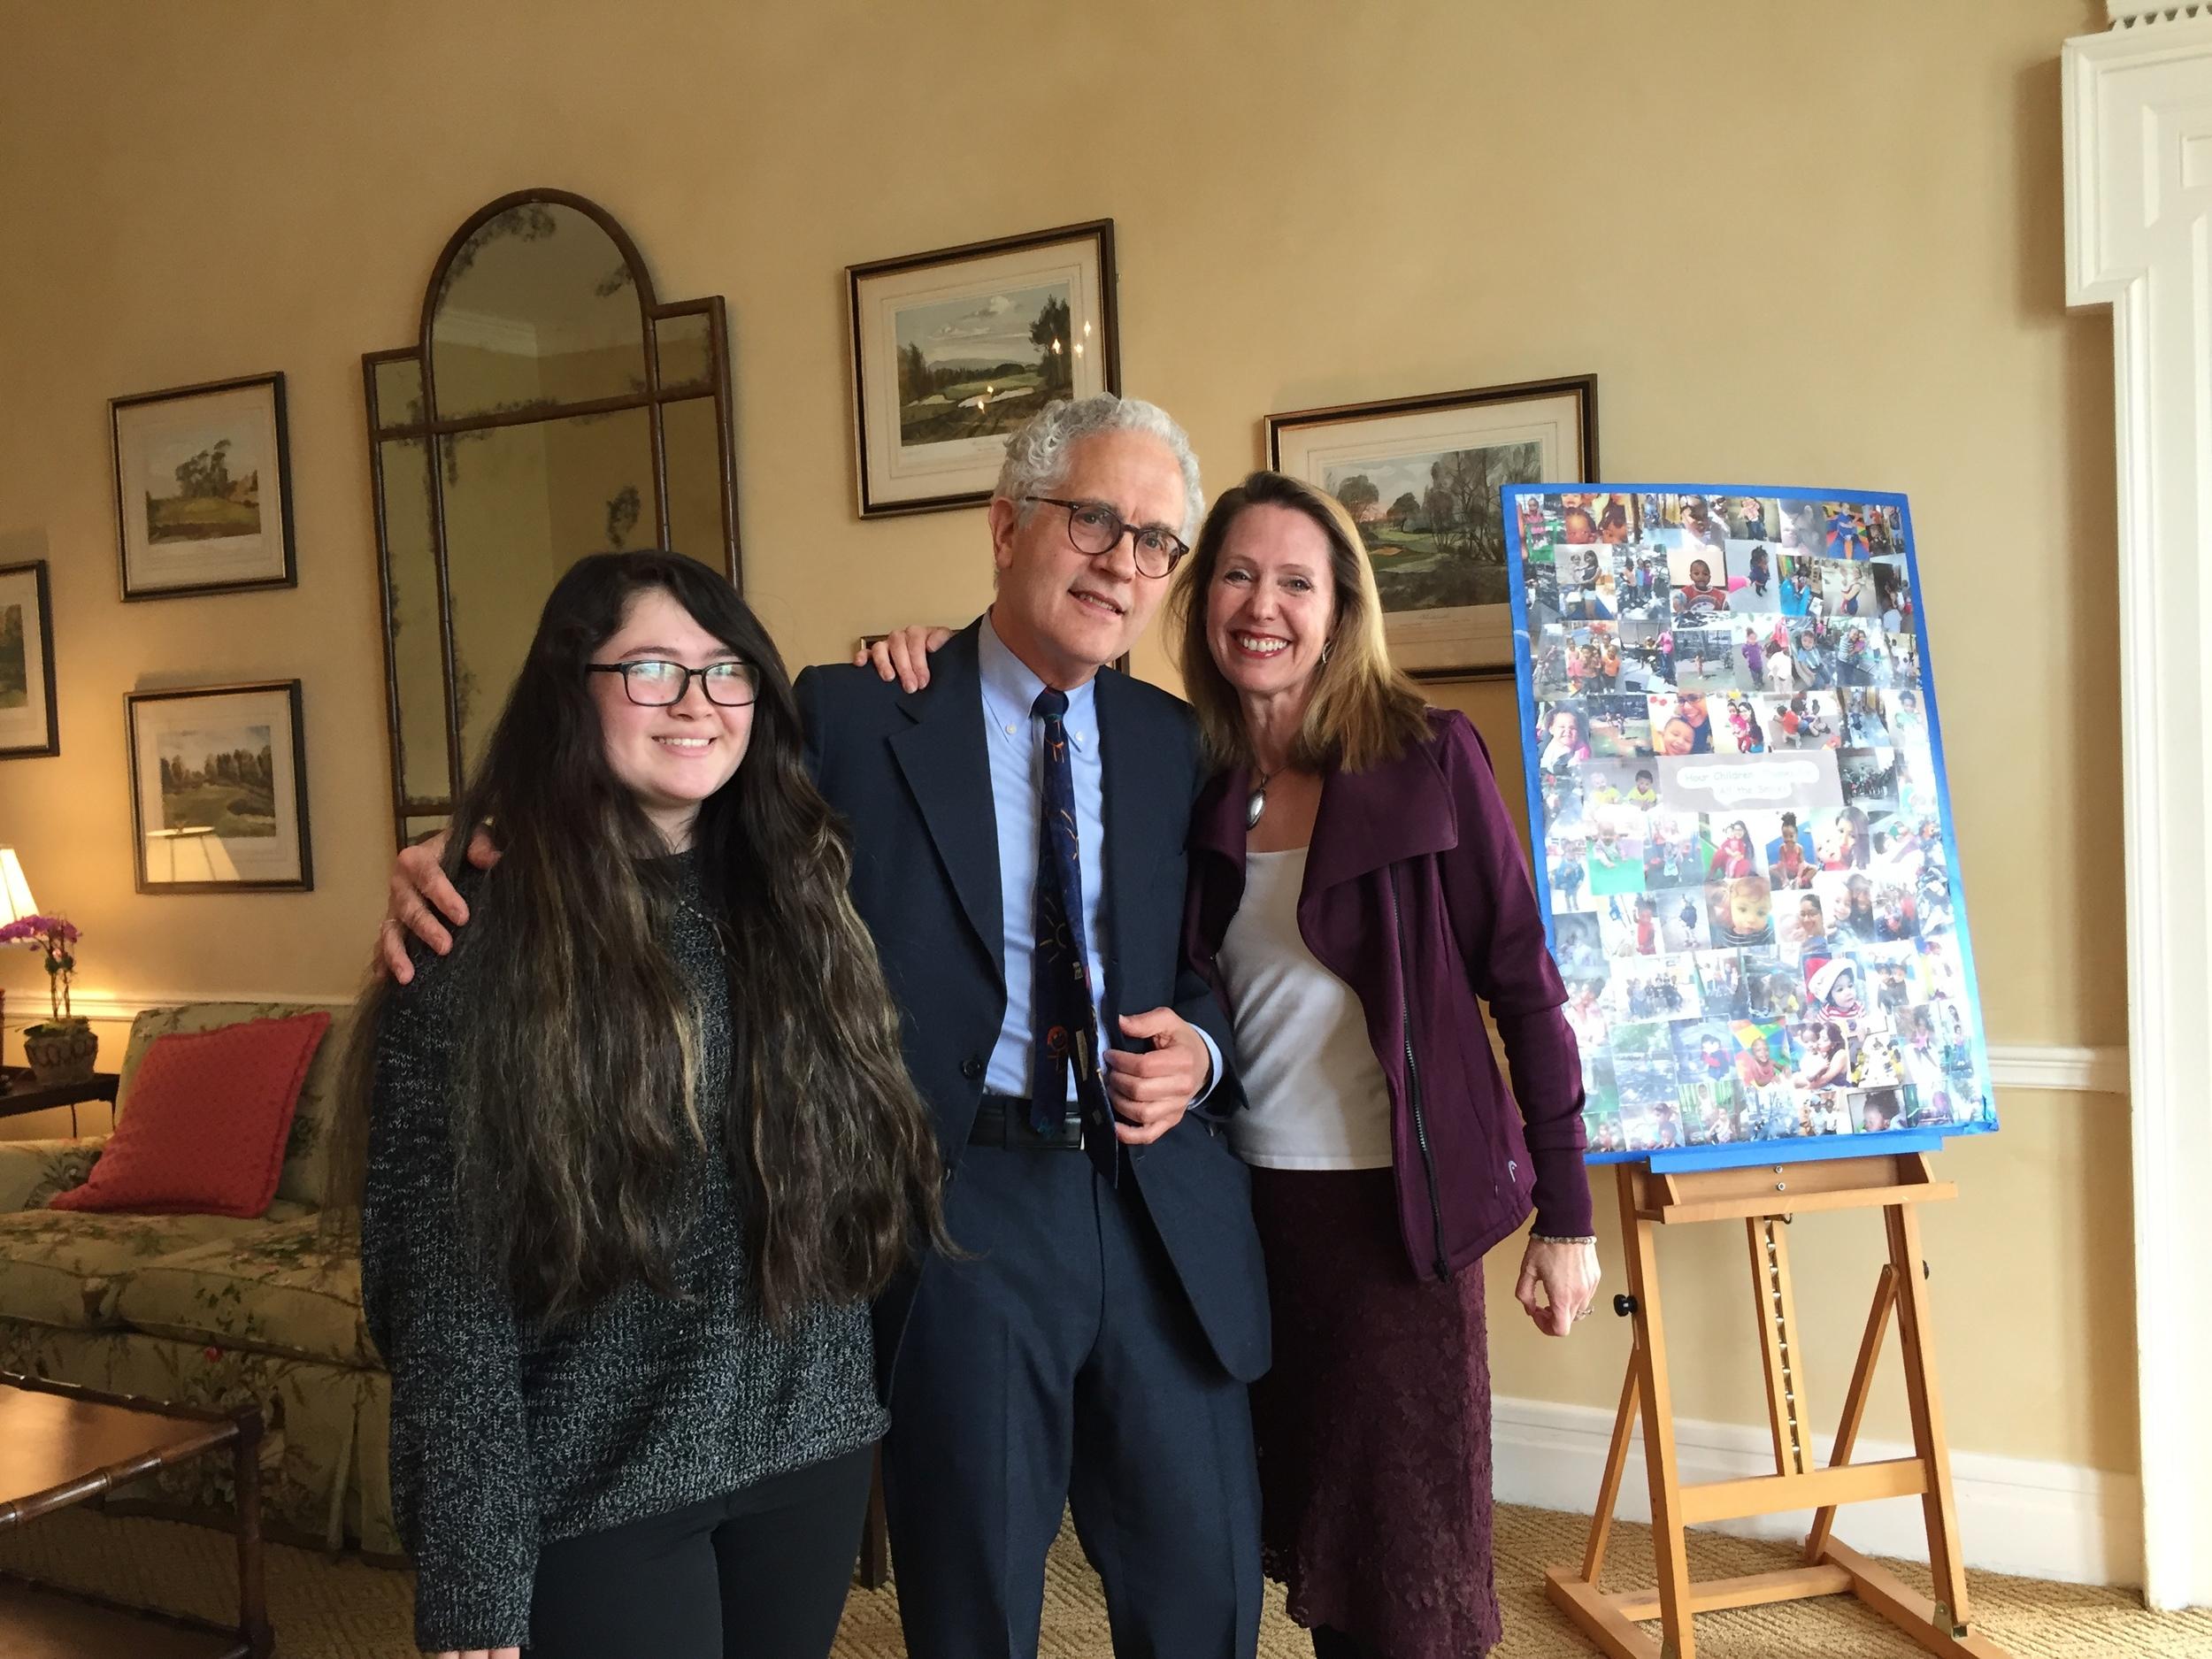 Tara Curran, Michael Minard, and Beth Blatt